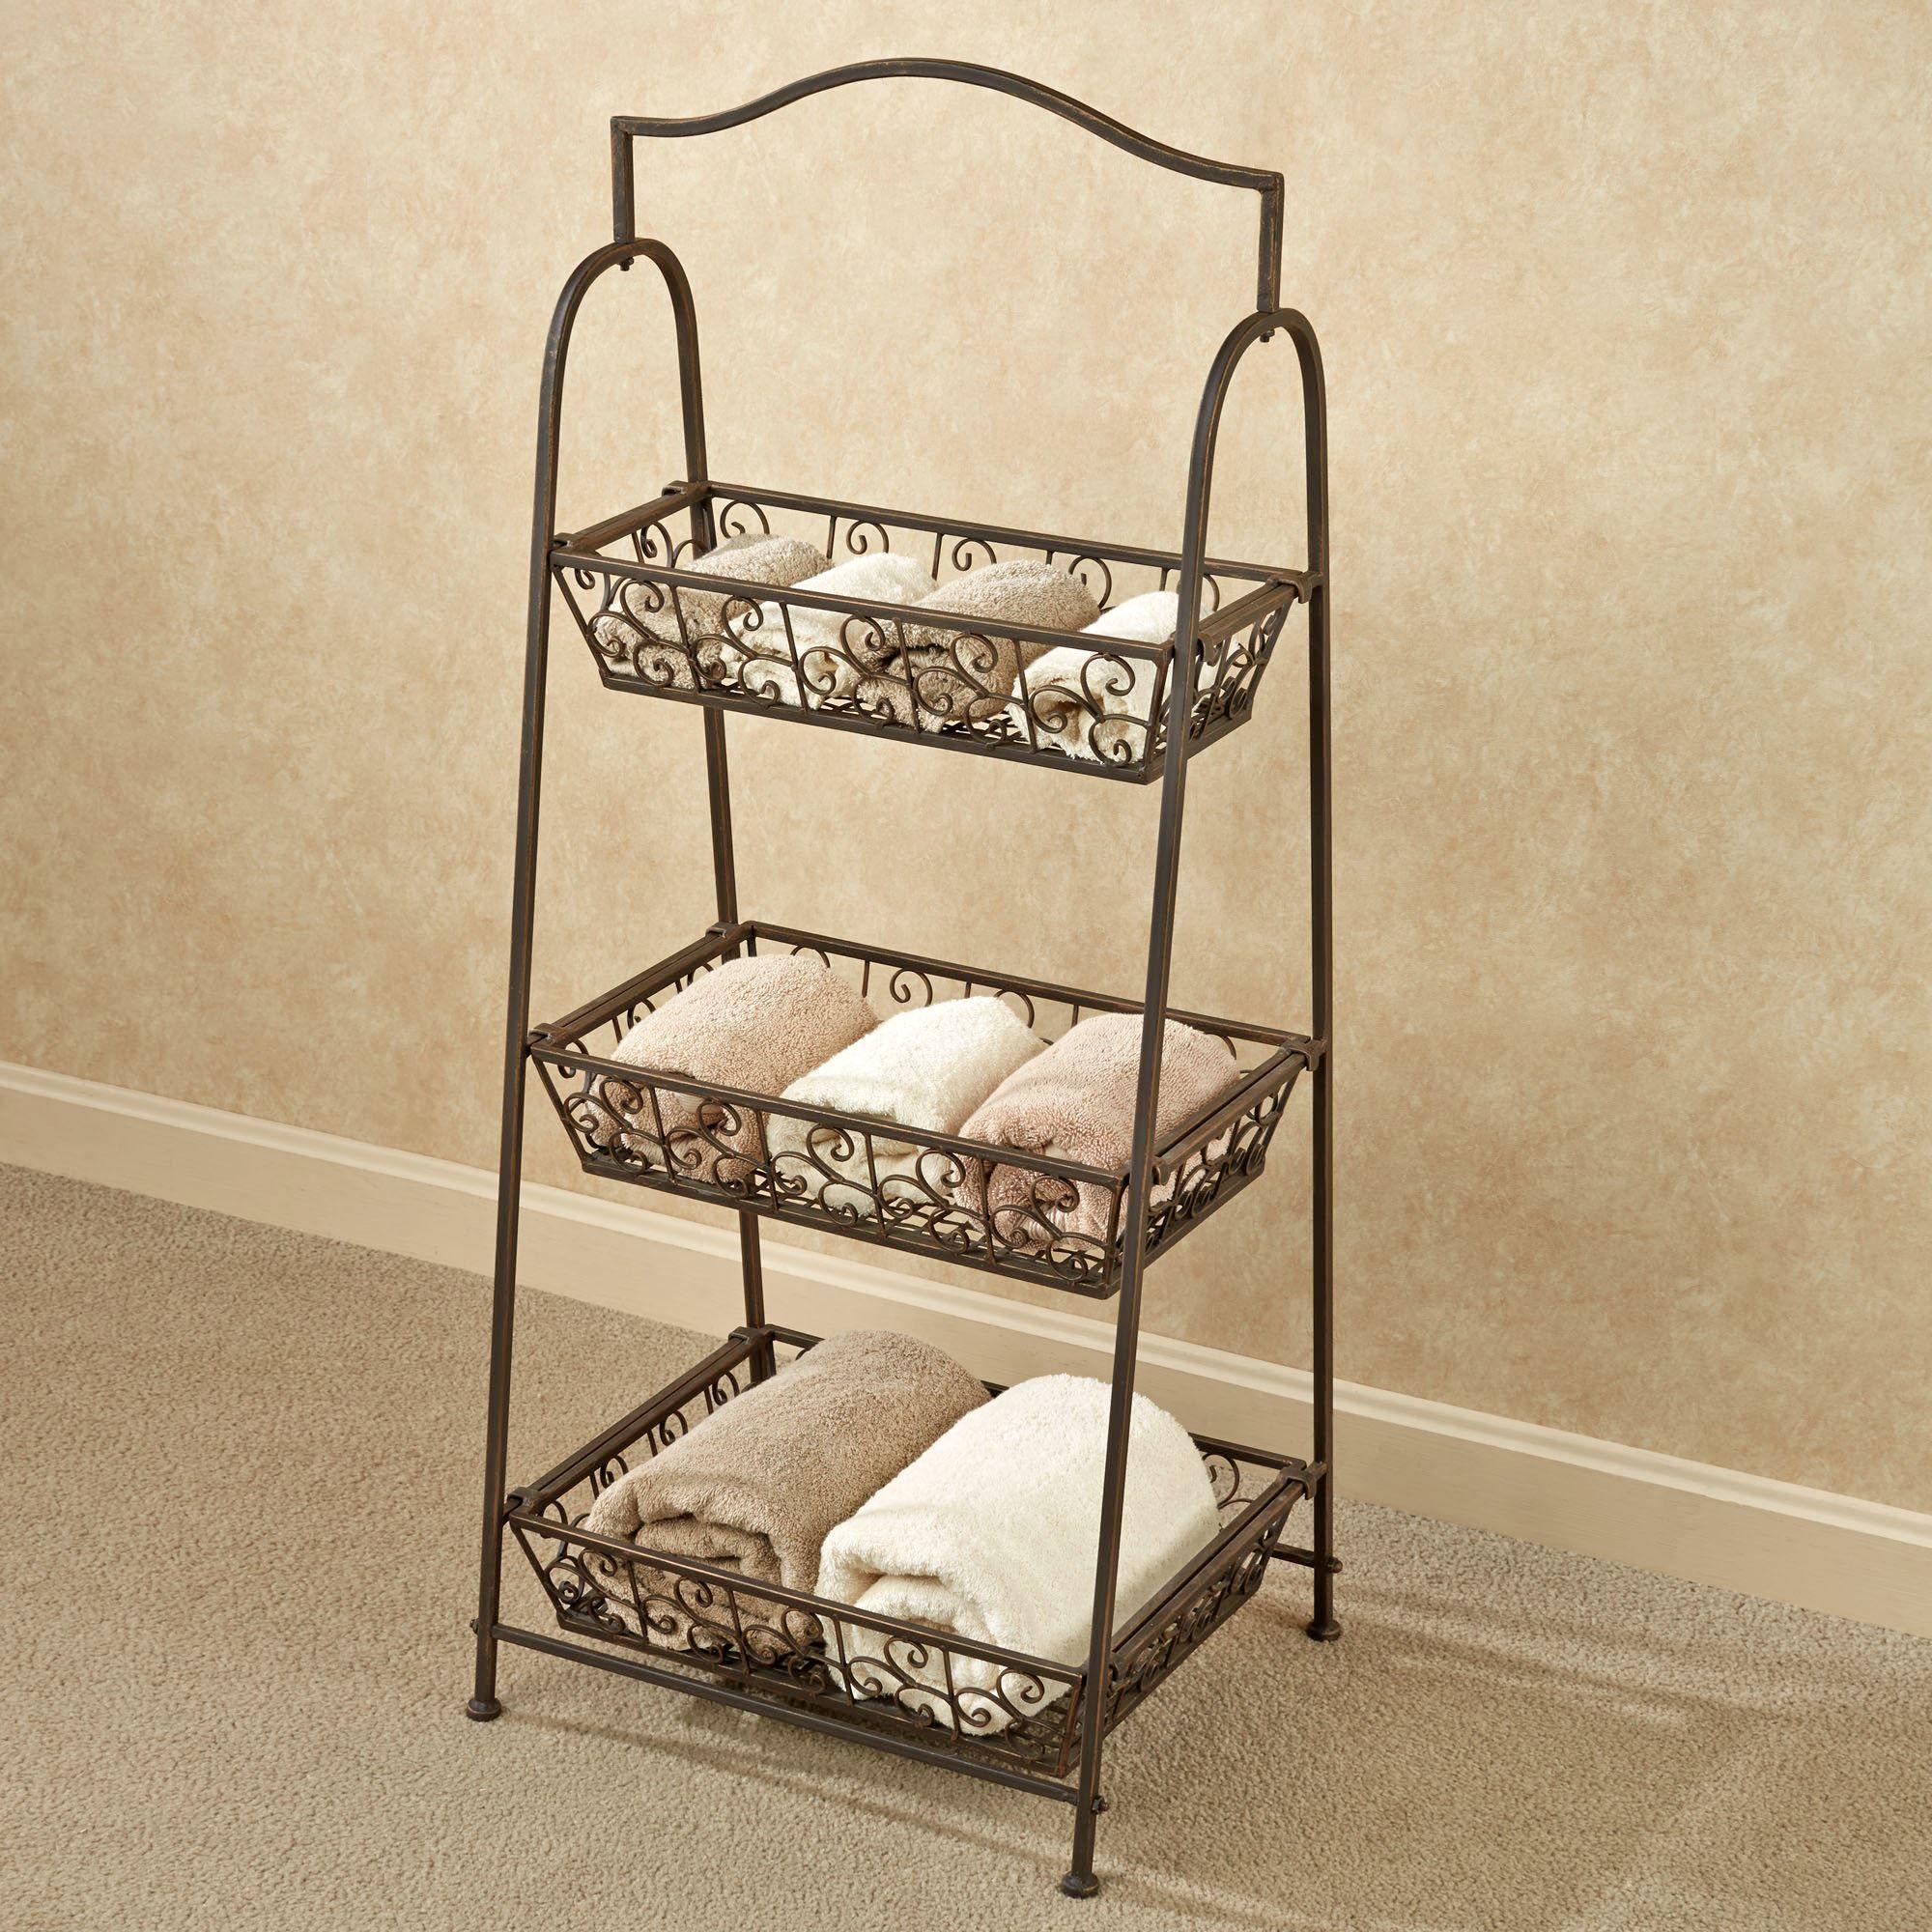 Attractive Bellini Wrought Iron Tiered Basket Storage Rack SK92